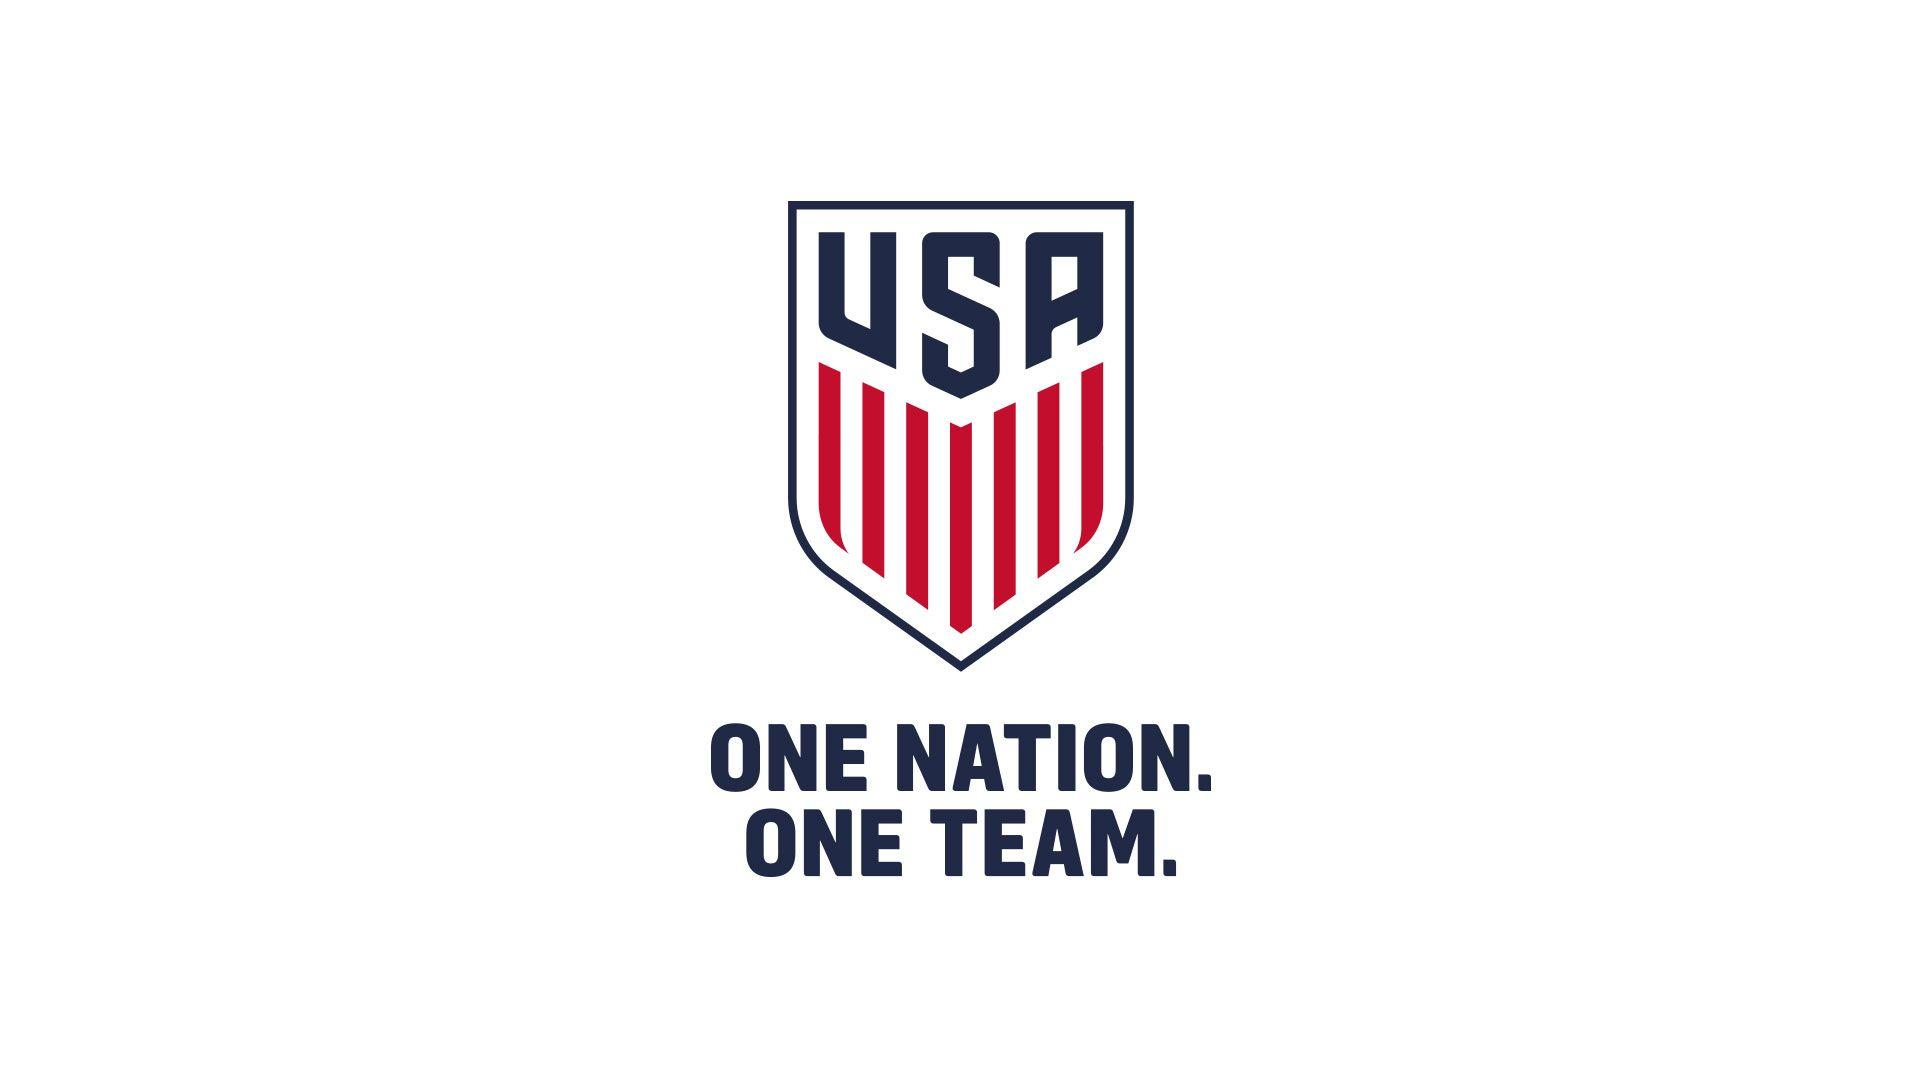 Usa Soccer Wallpapers: Us Soccer Wallpaper